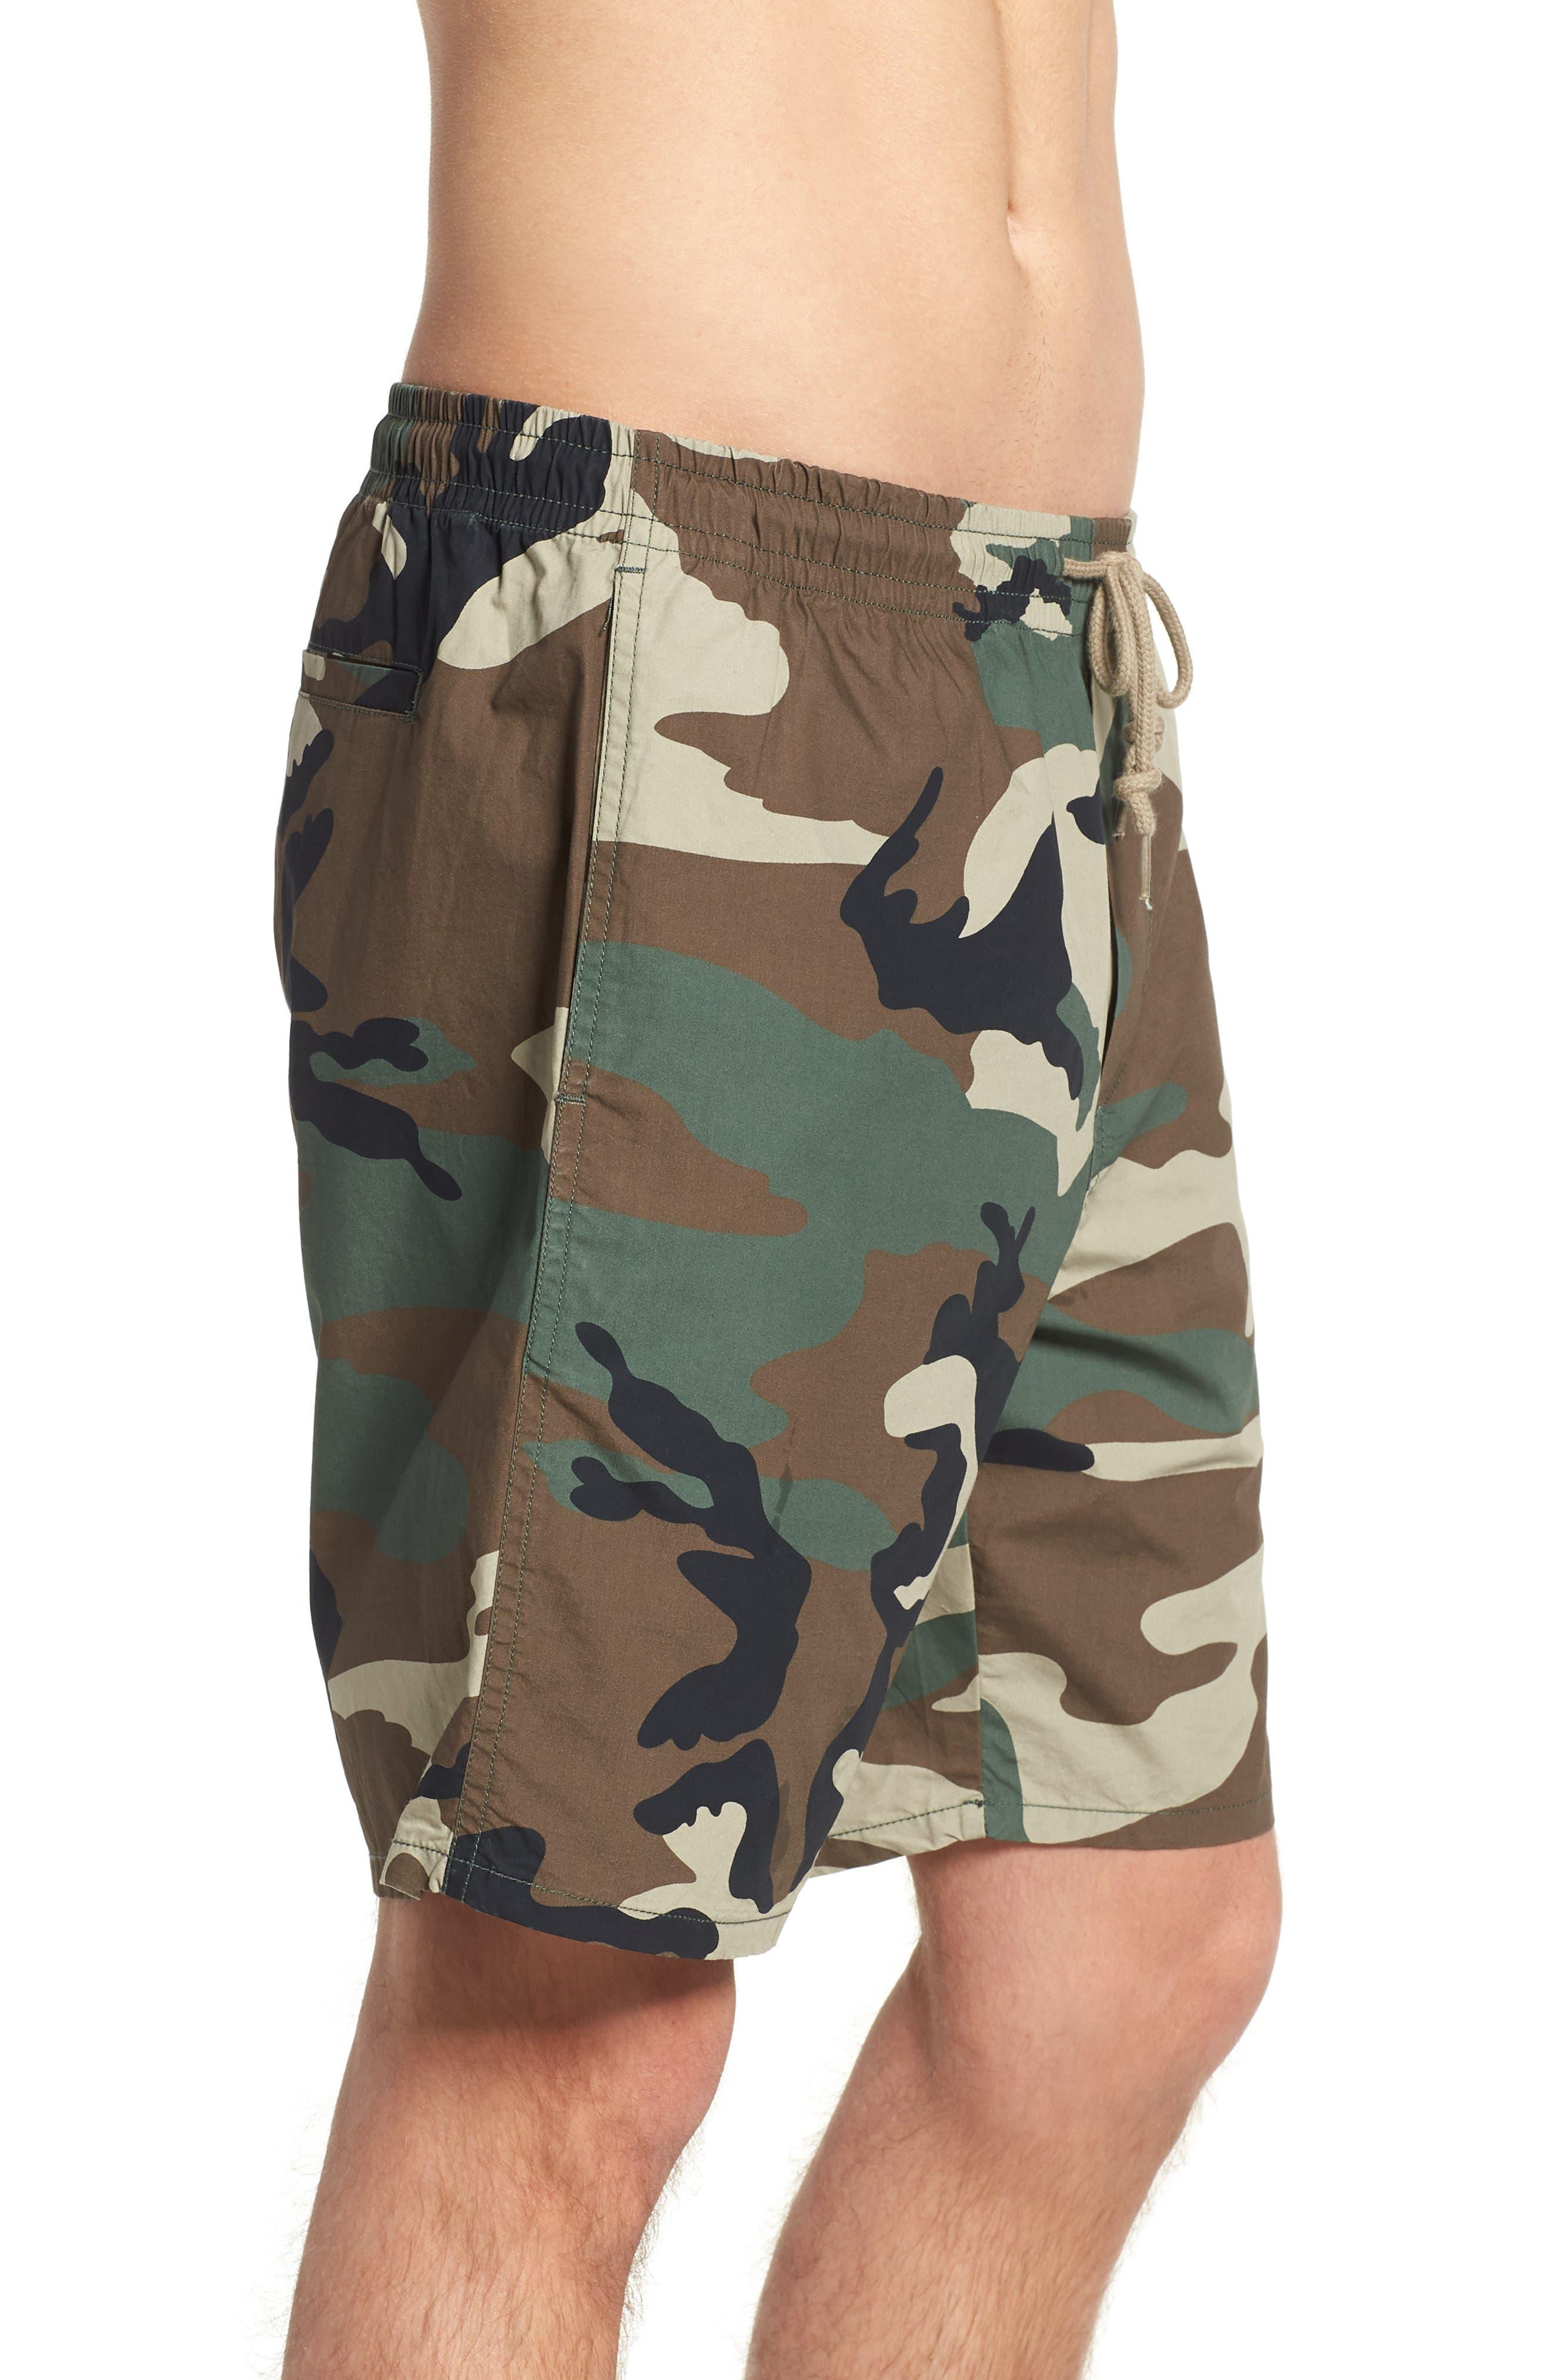 Subversion Shorts,                             Alternate thumbnail 3, color,                             Field Camo